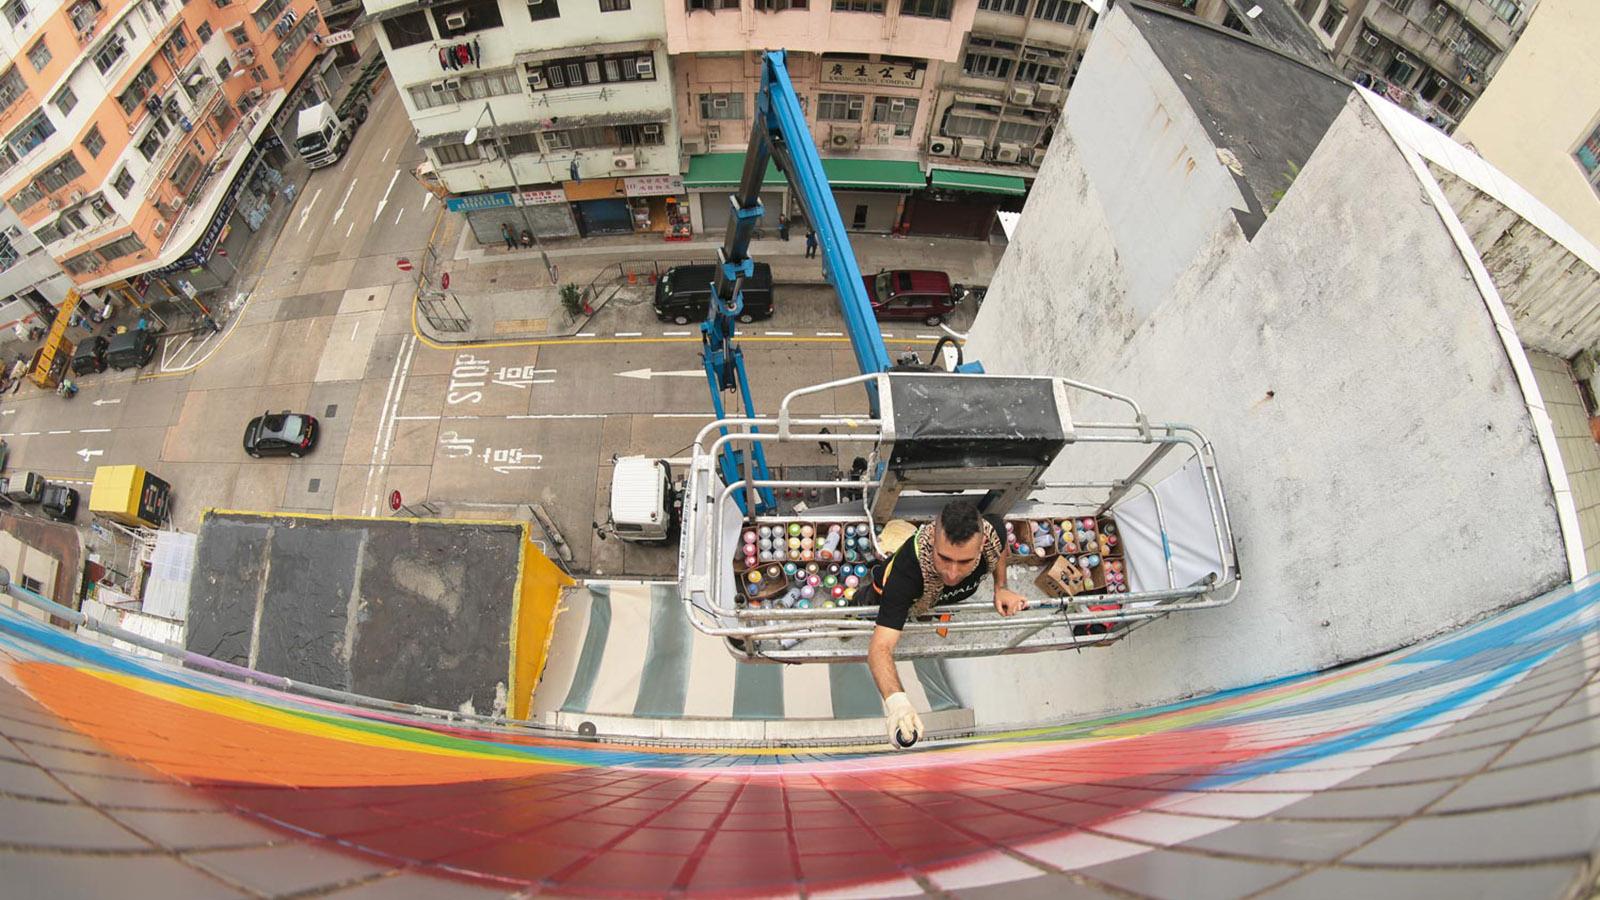 Hong Kong street art: Six unusual tours you can take | CNN Travel